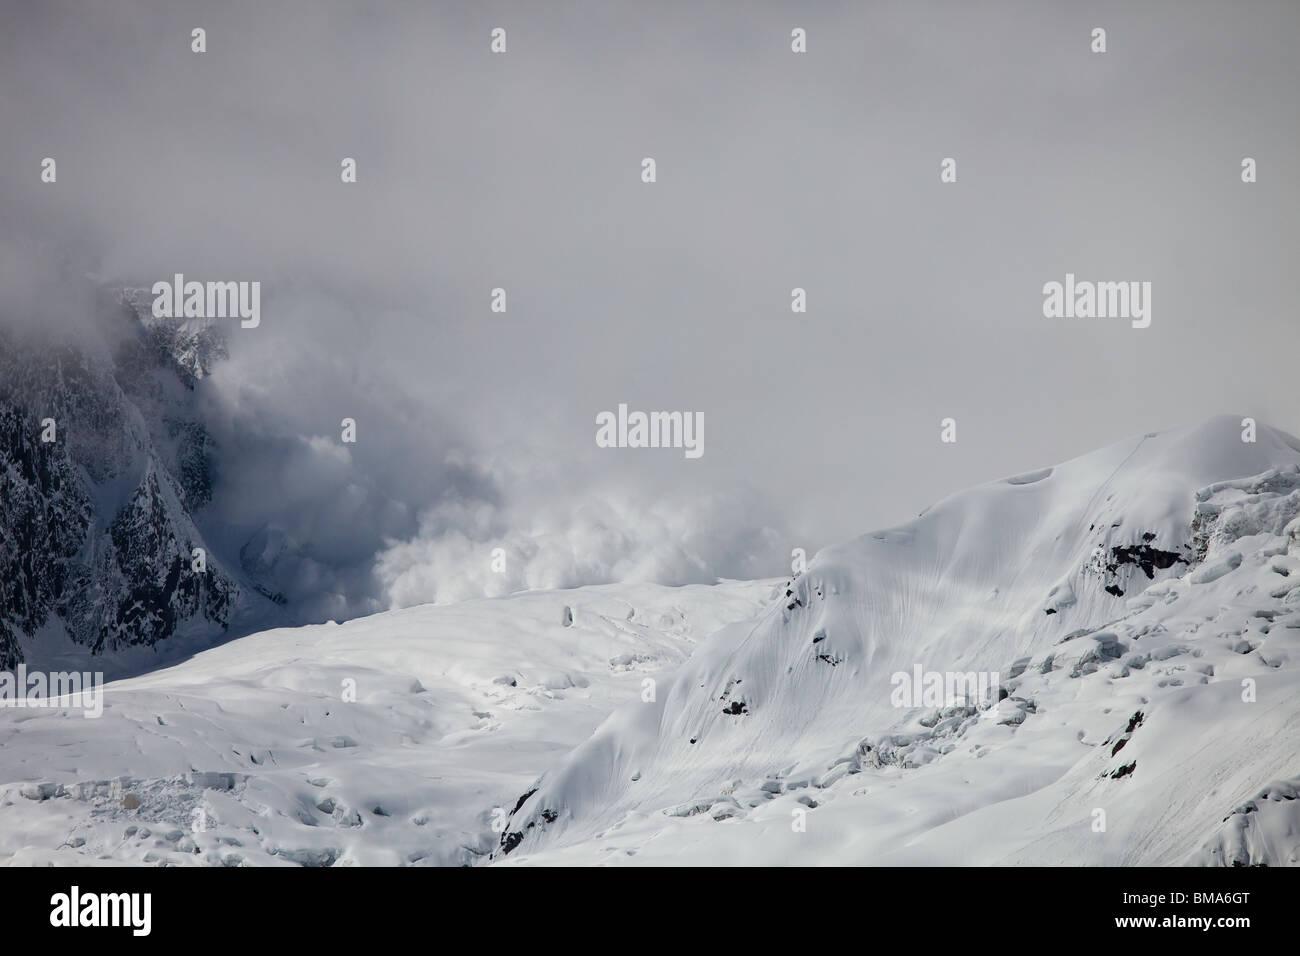 Avalanche in the Rakaposhi Range, Hunza, Pakistan - Stock Image